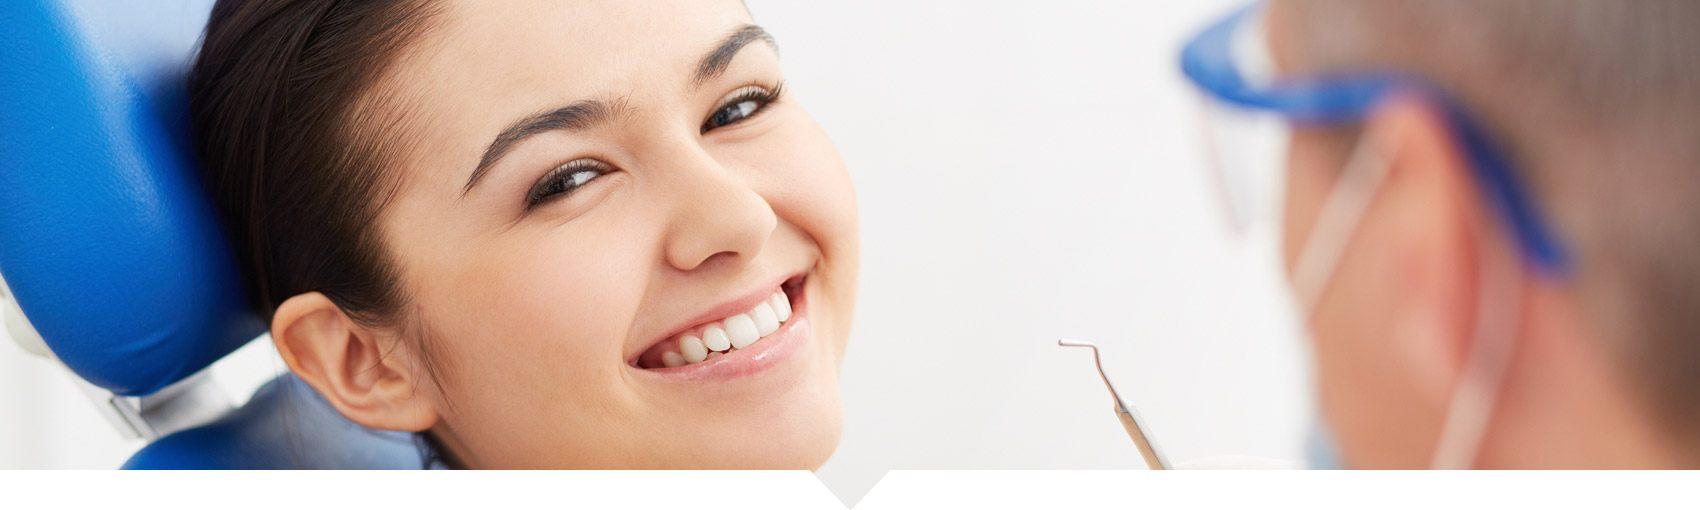 Meet Our Team - Ontario Dental Center